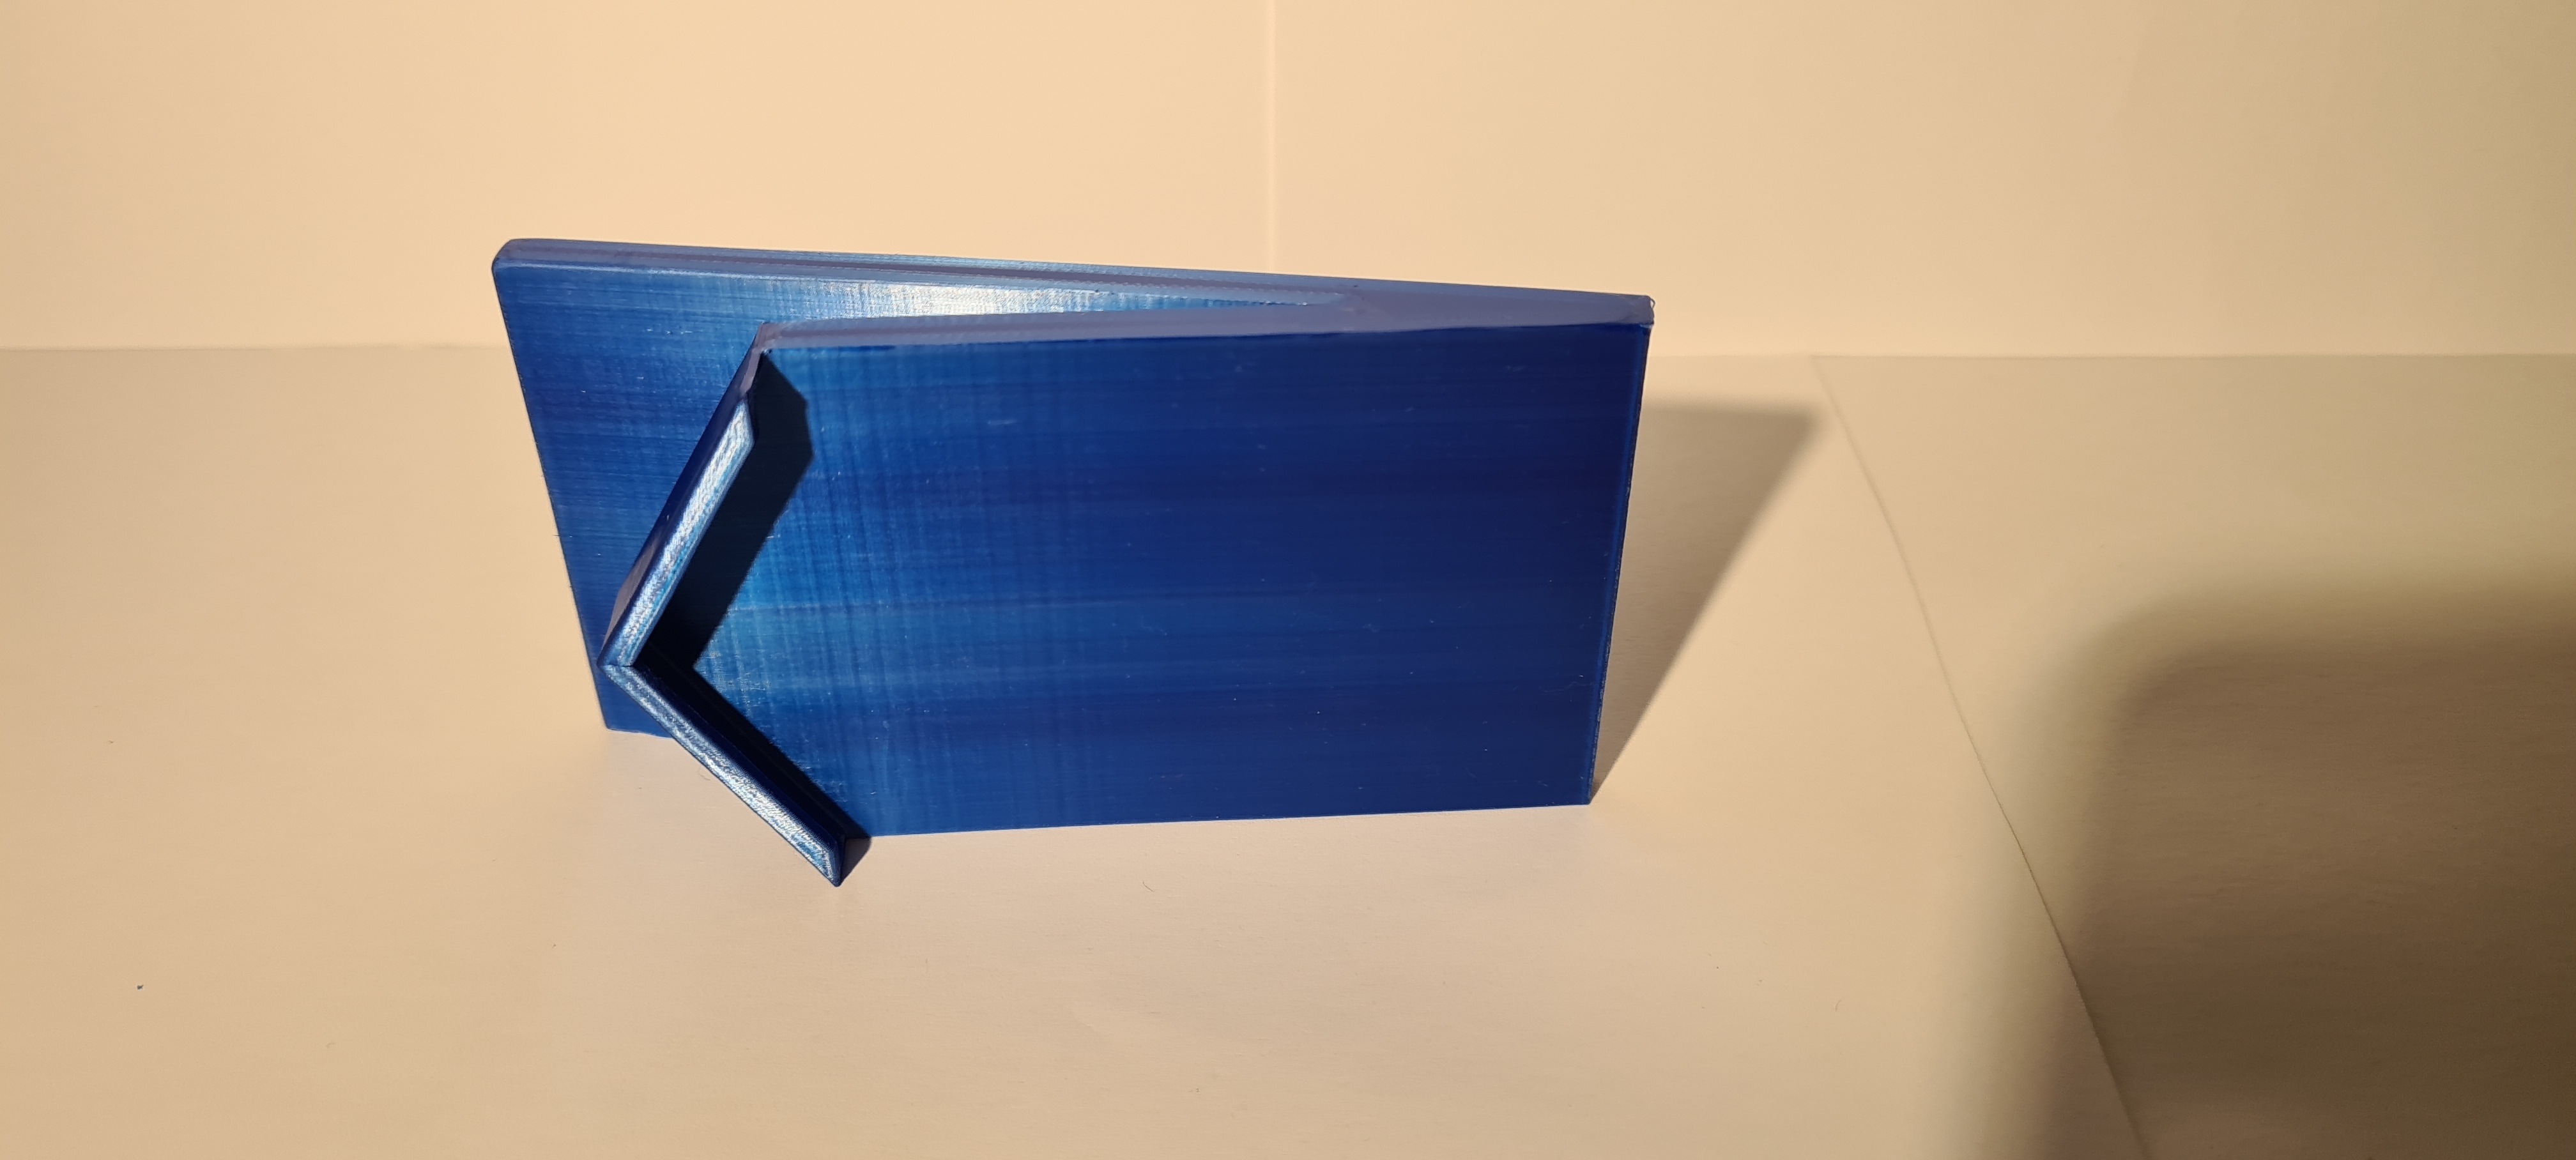 20201017_161915.jpg Télécharger fichier STL Logo italia figc • Objet imprimable en 3D, zimatera